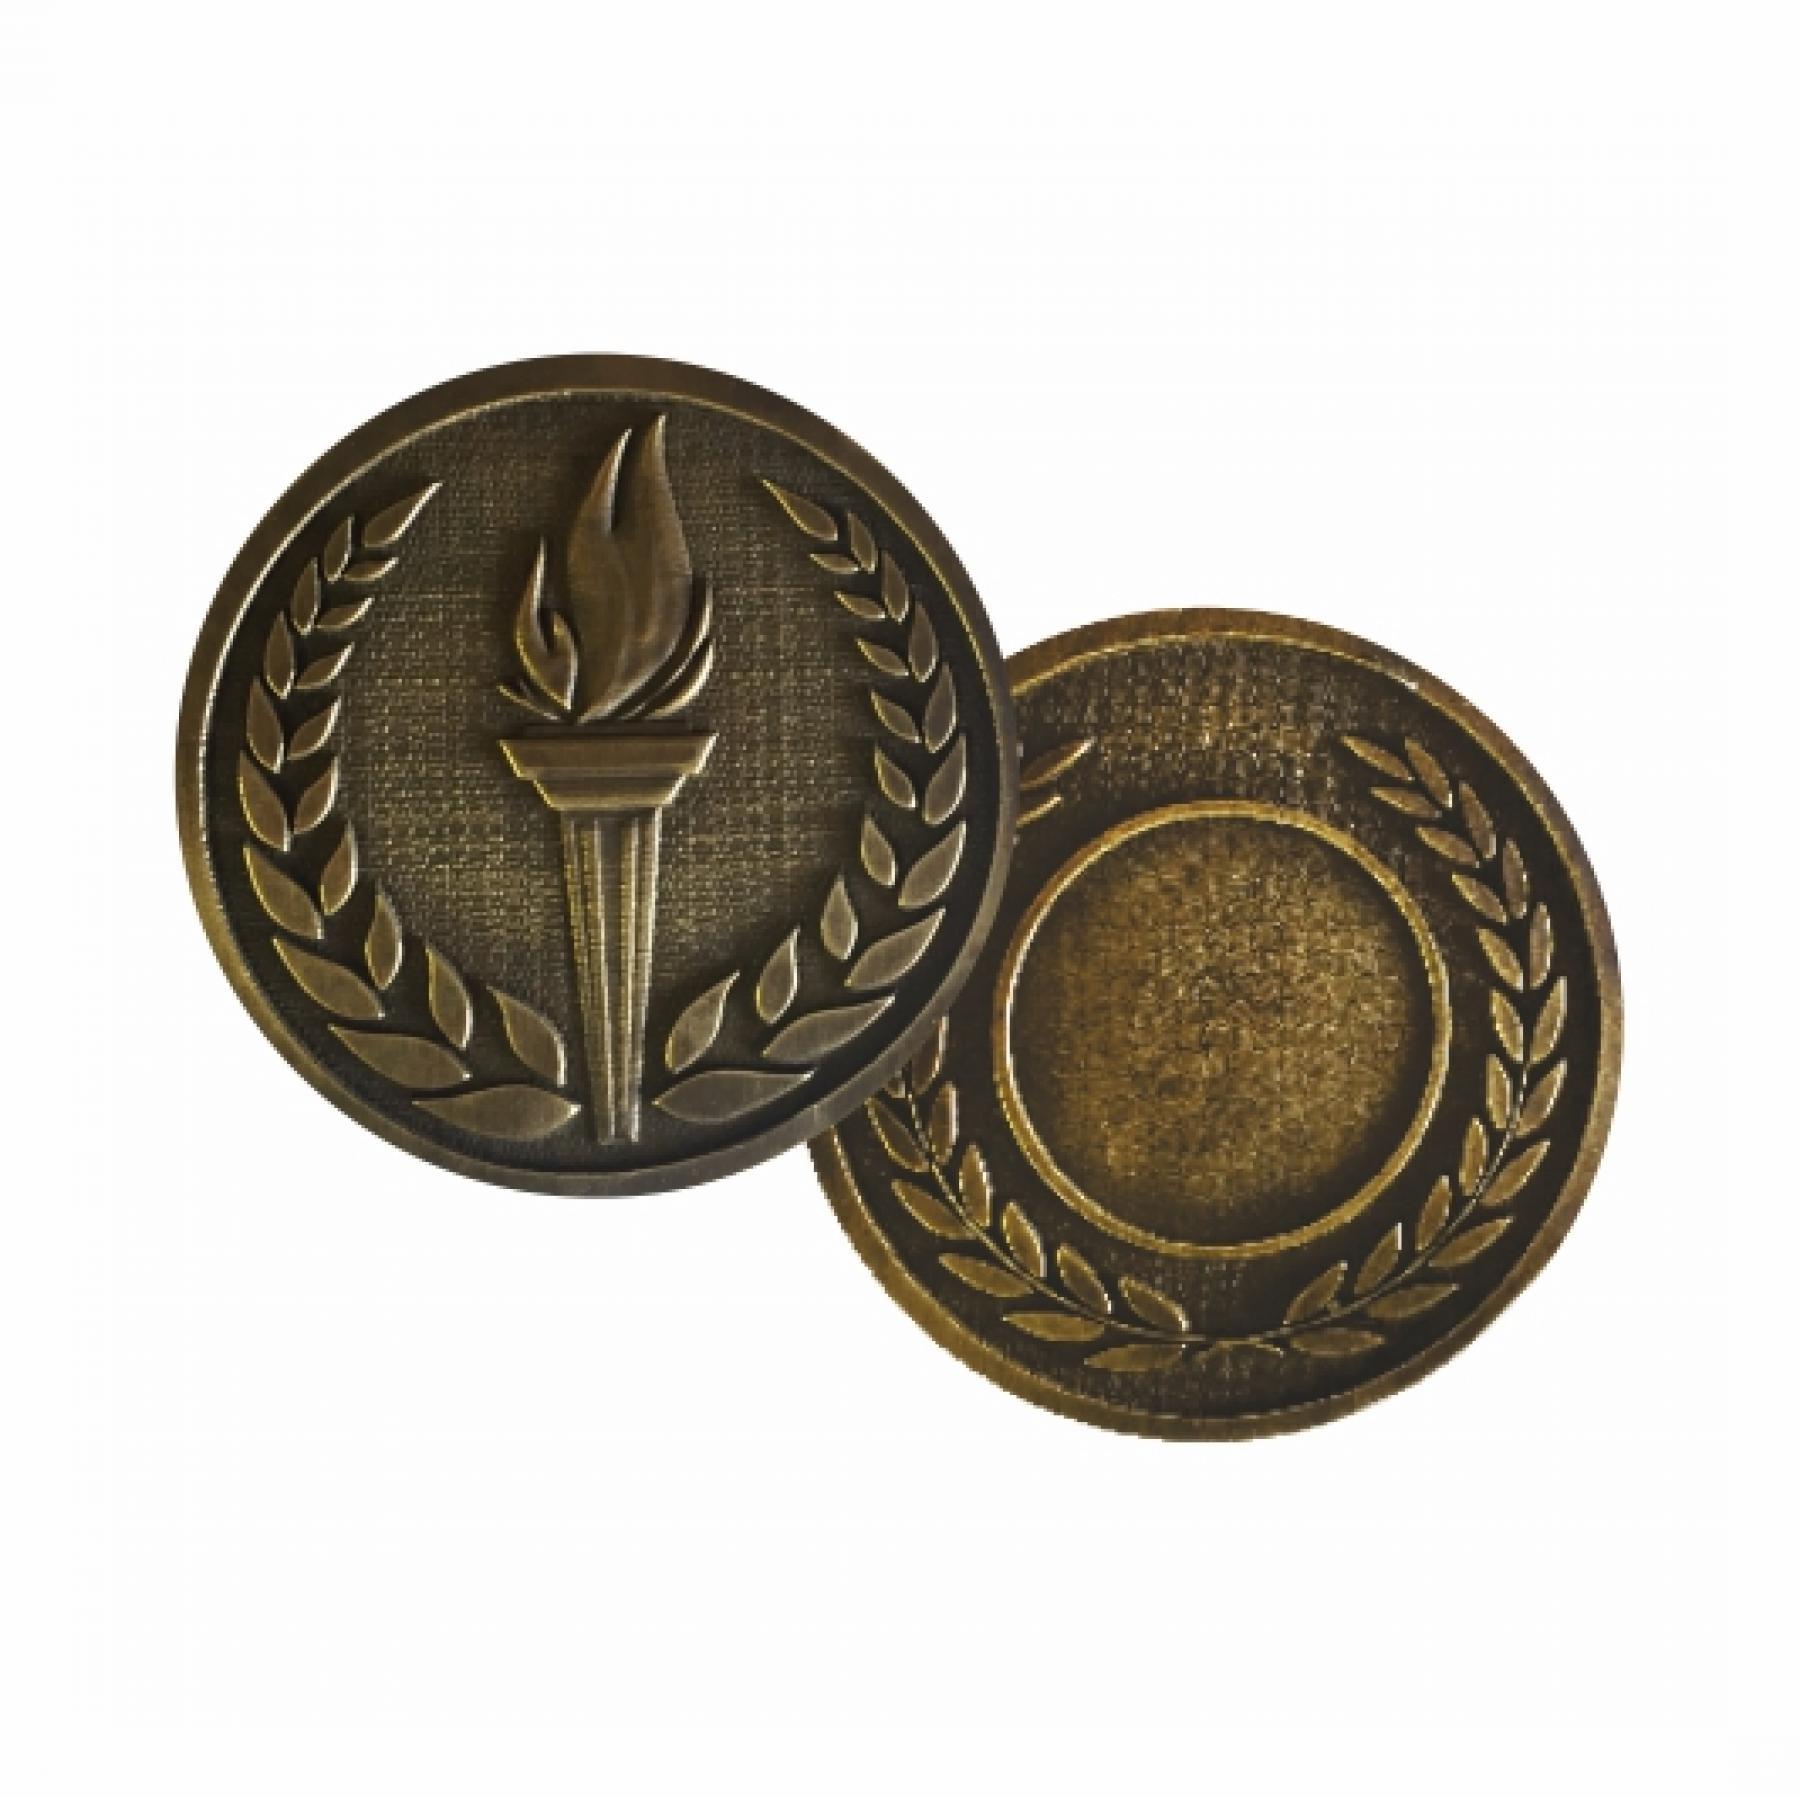 Xco Plated Medals Achievement Bronze